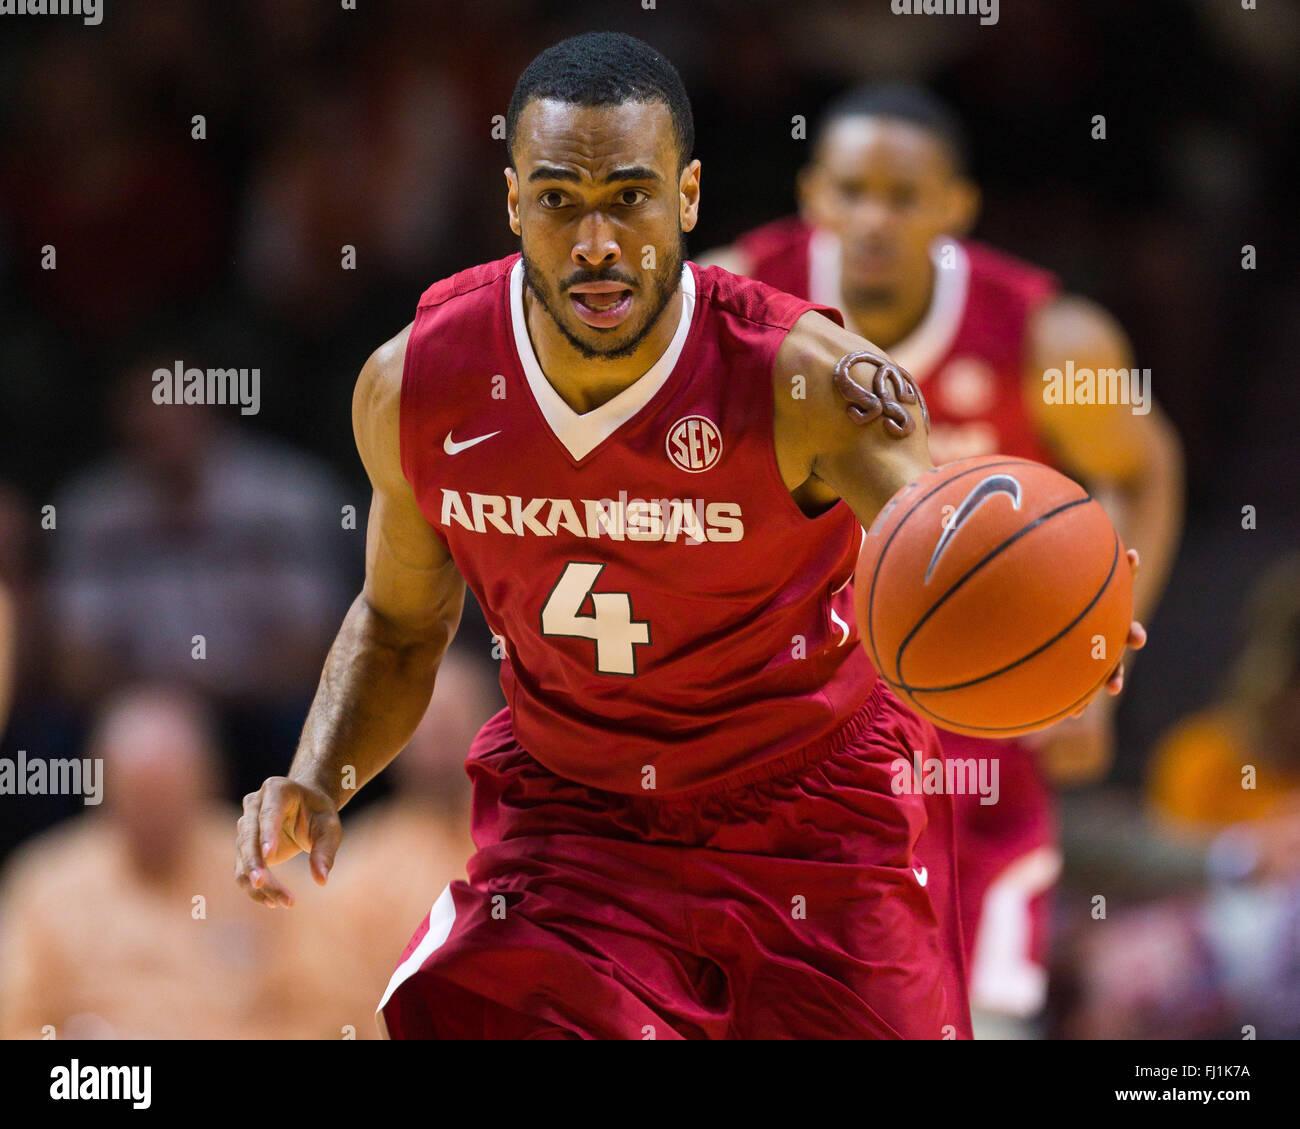 February 27, 2016: Jabril Durham #4 of the Arkansas